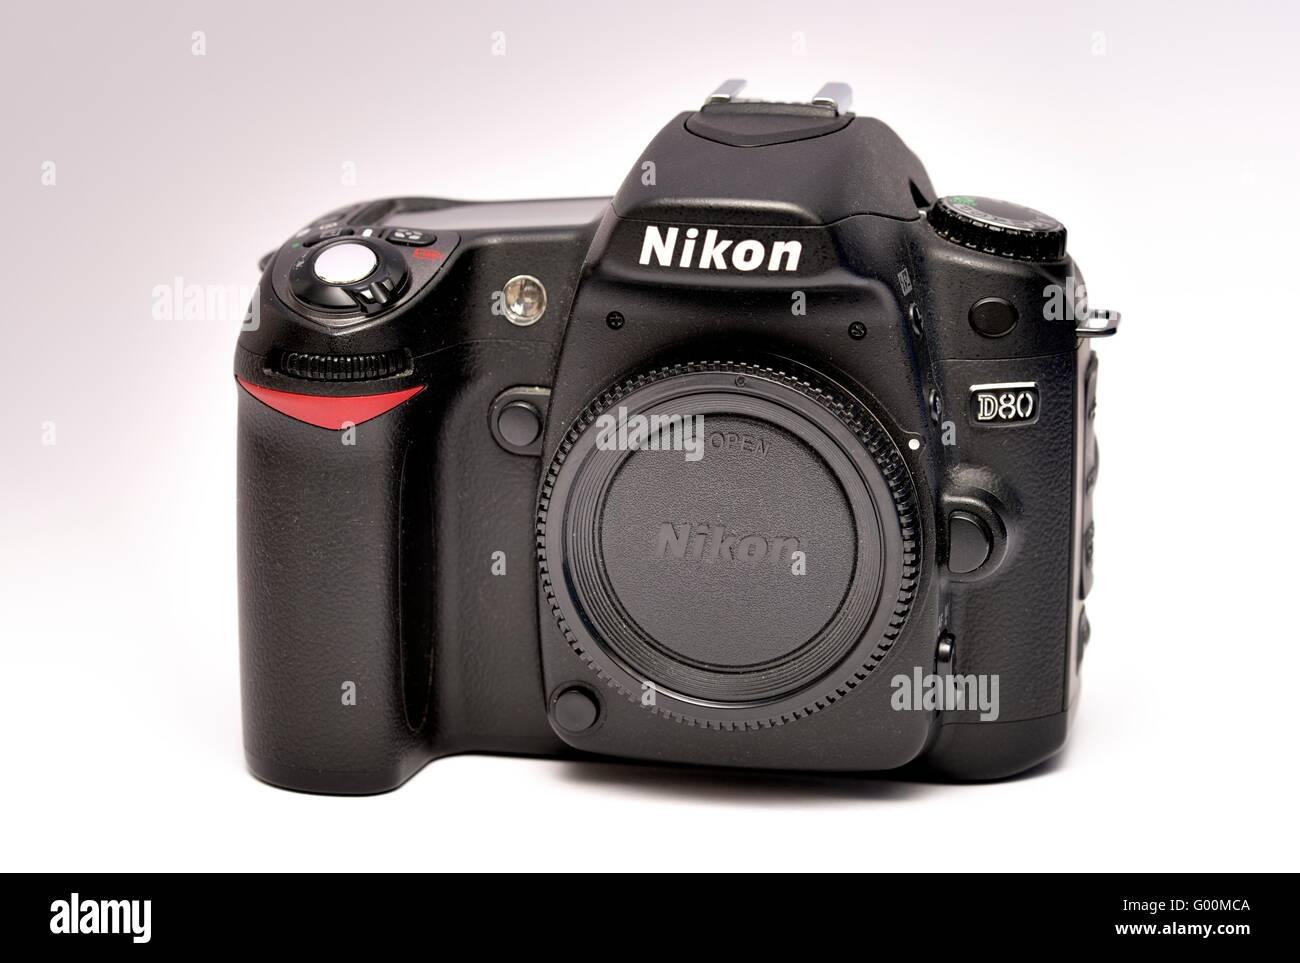 A Nikon D80 digital SLR camera - Stock Image